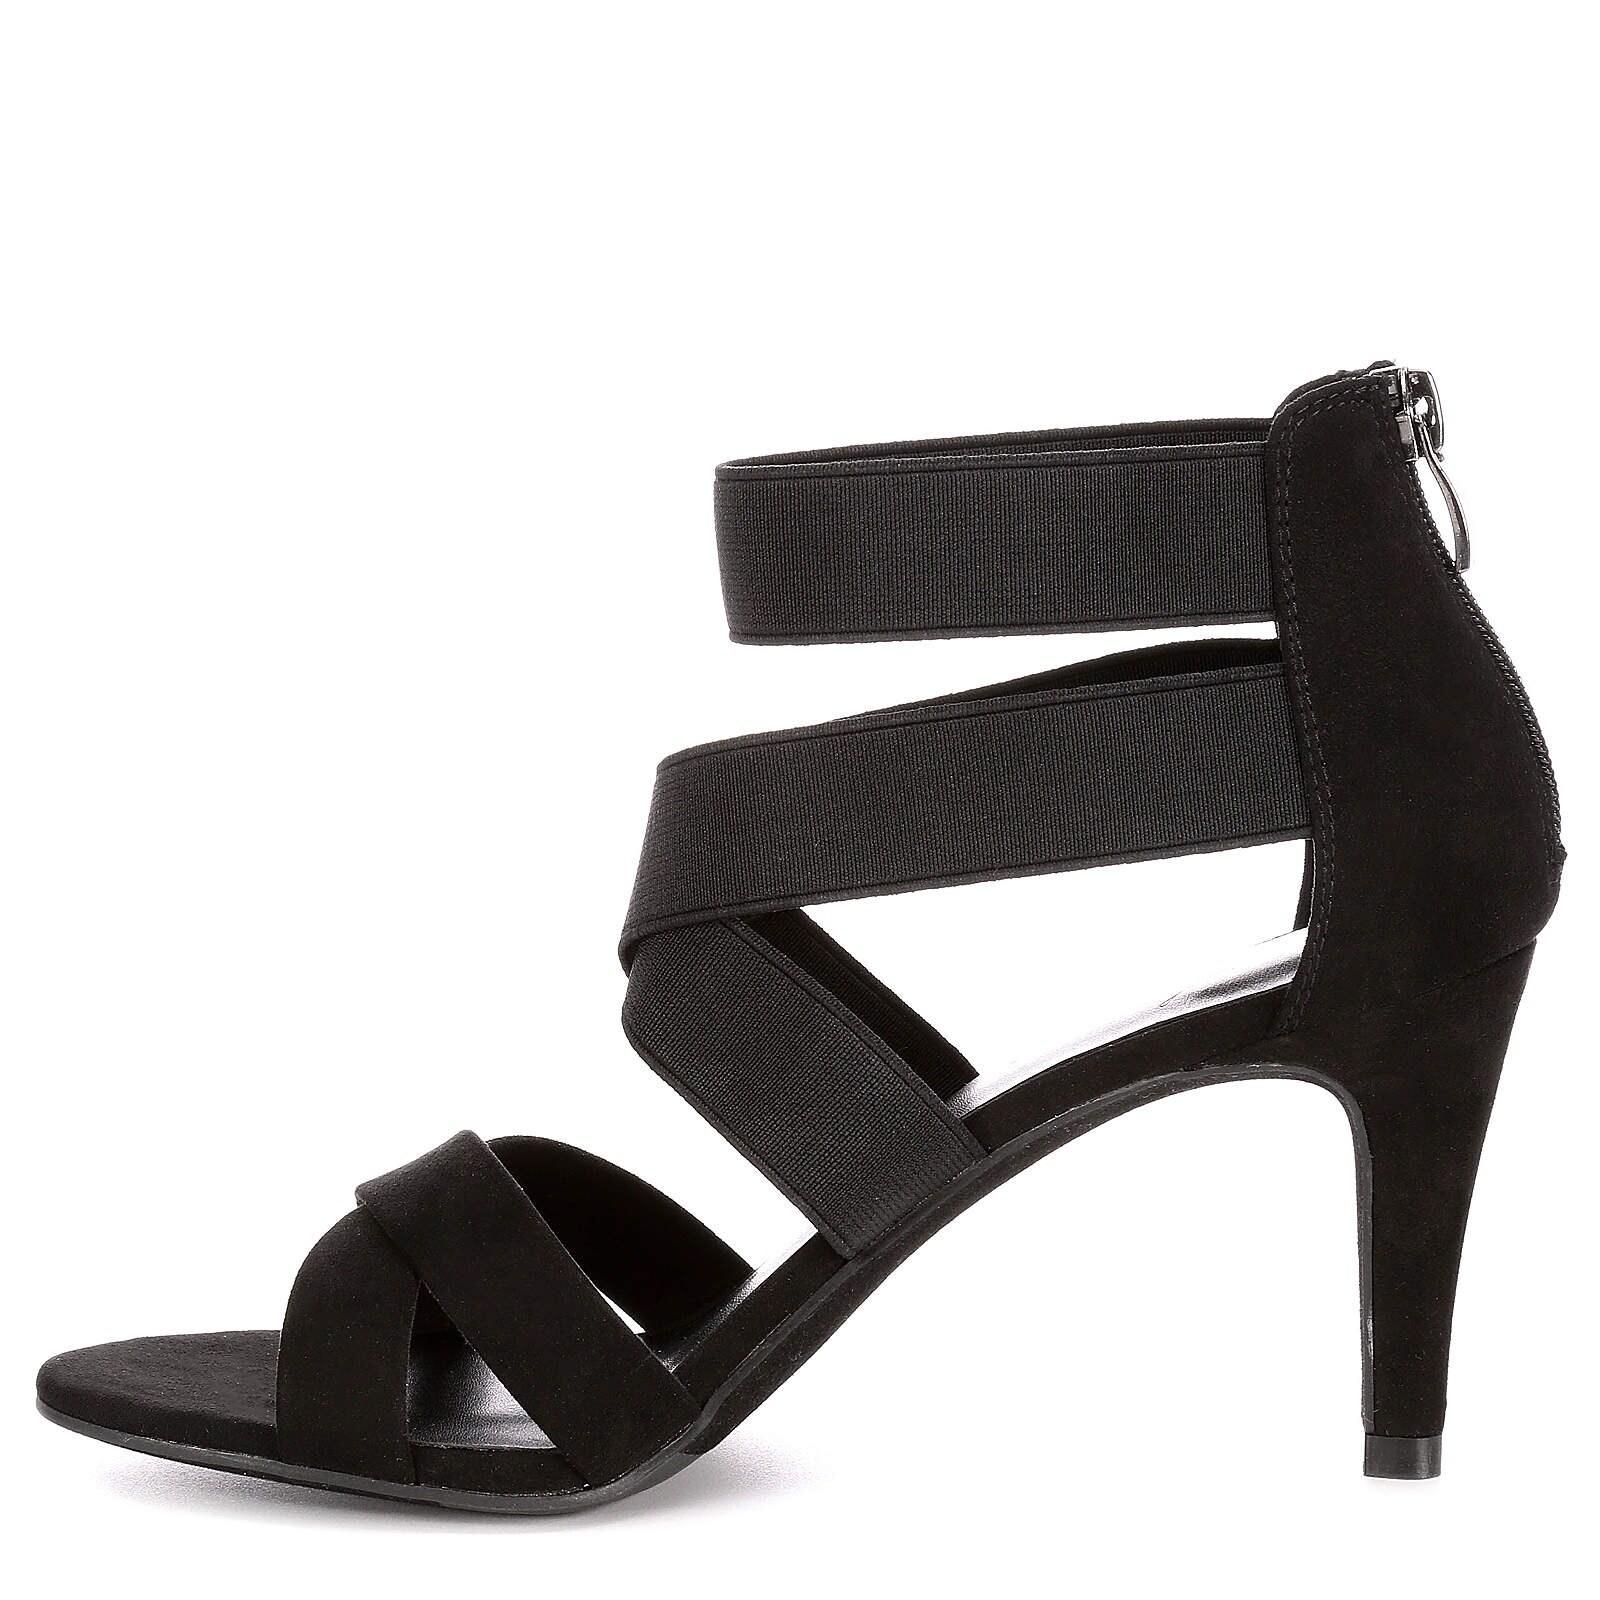 XAPPEAL Womens Elke High Heel Sandal Shoes